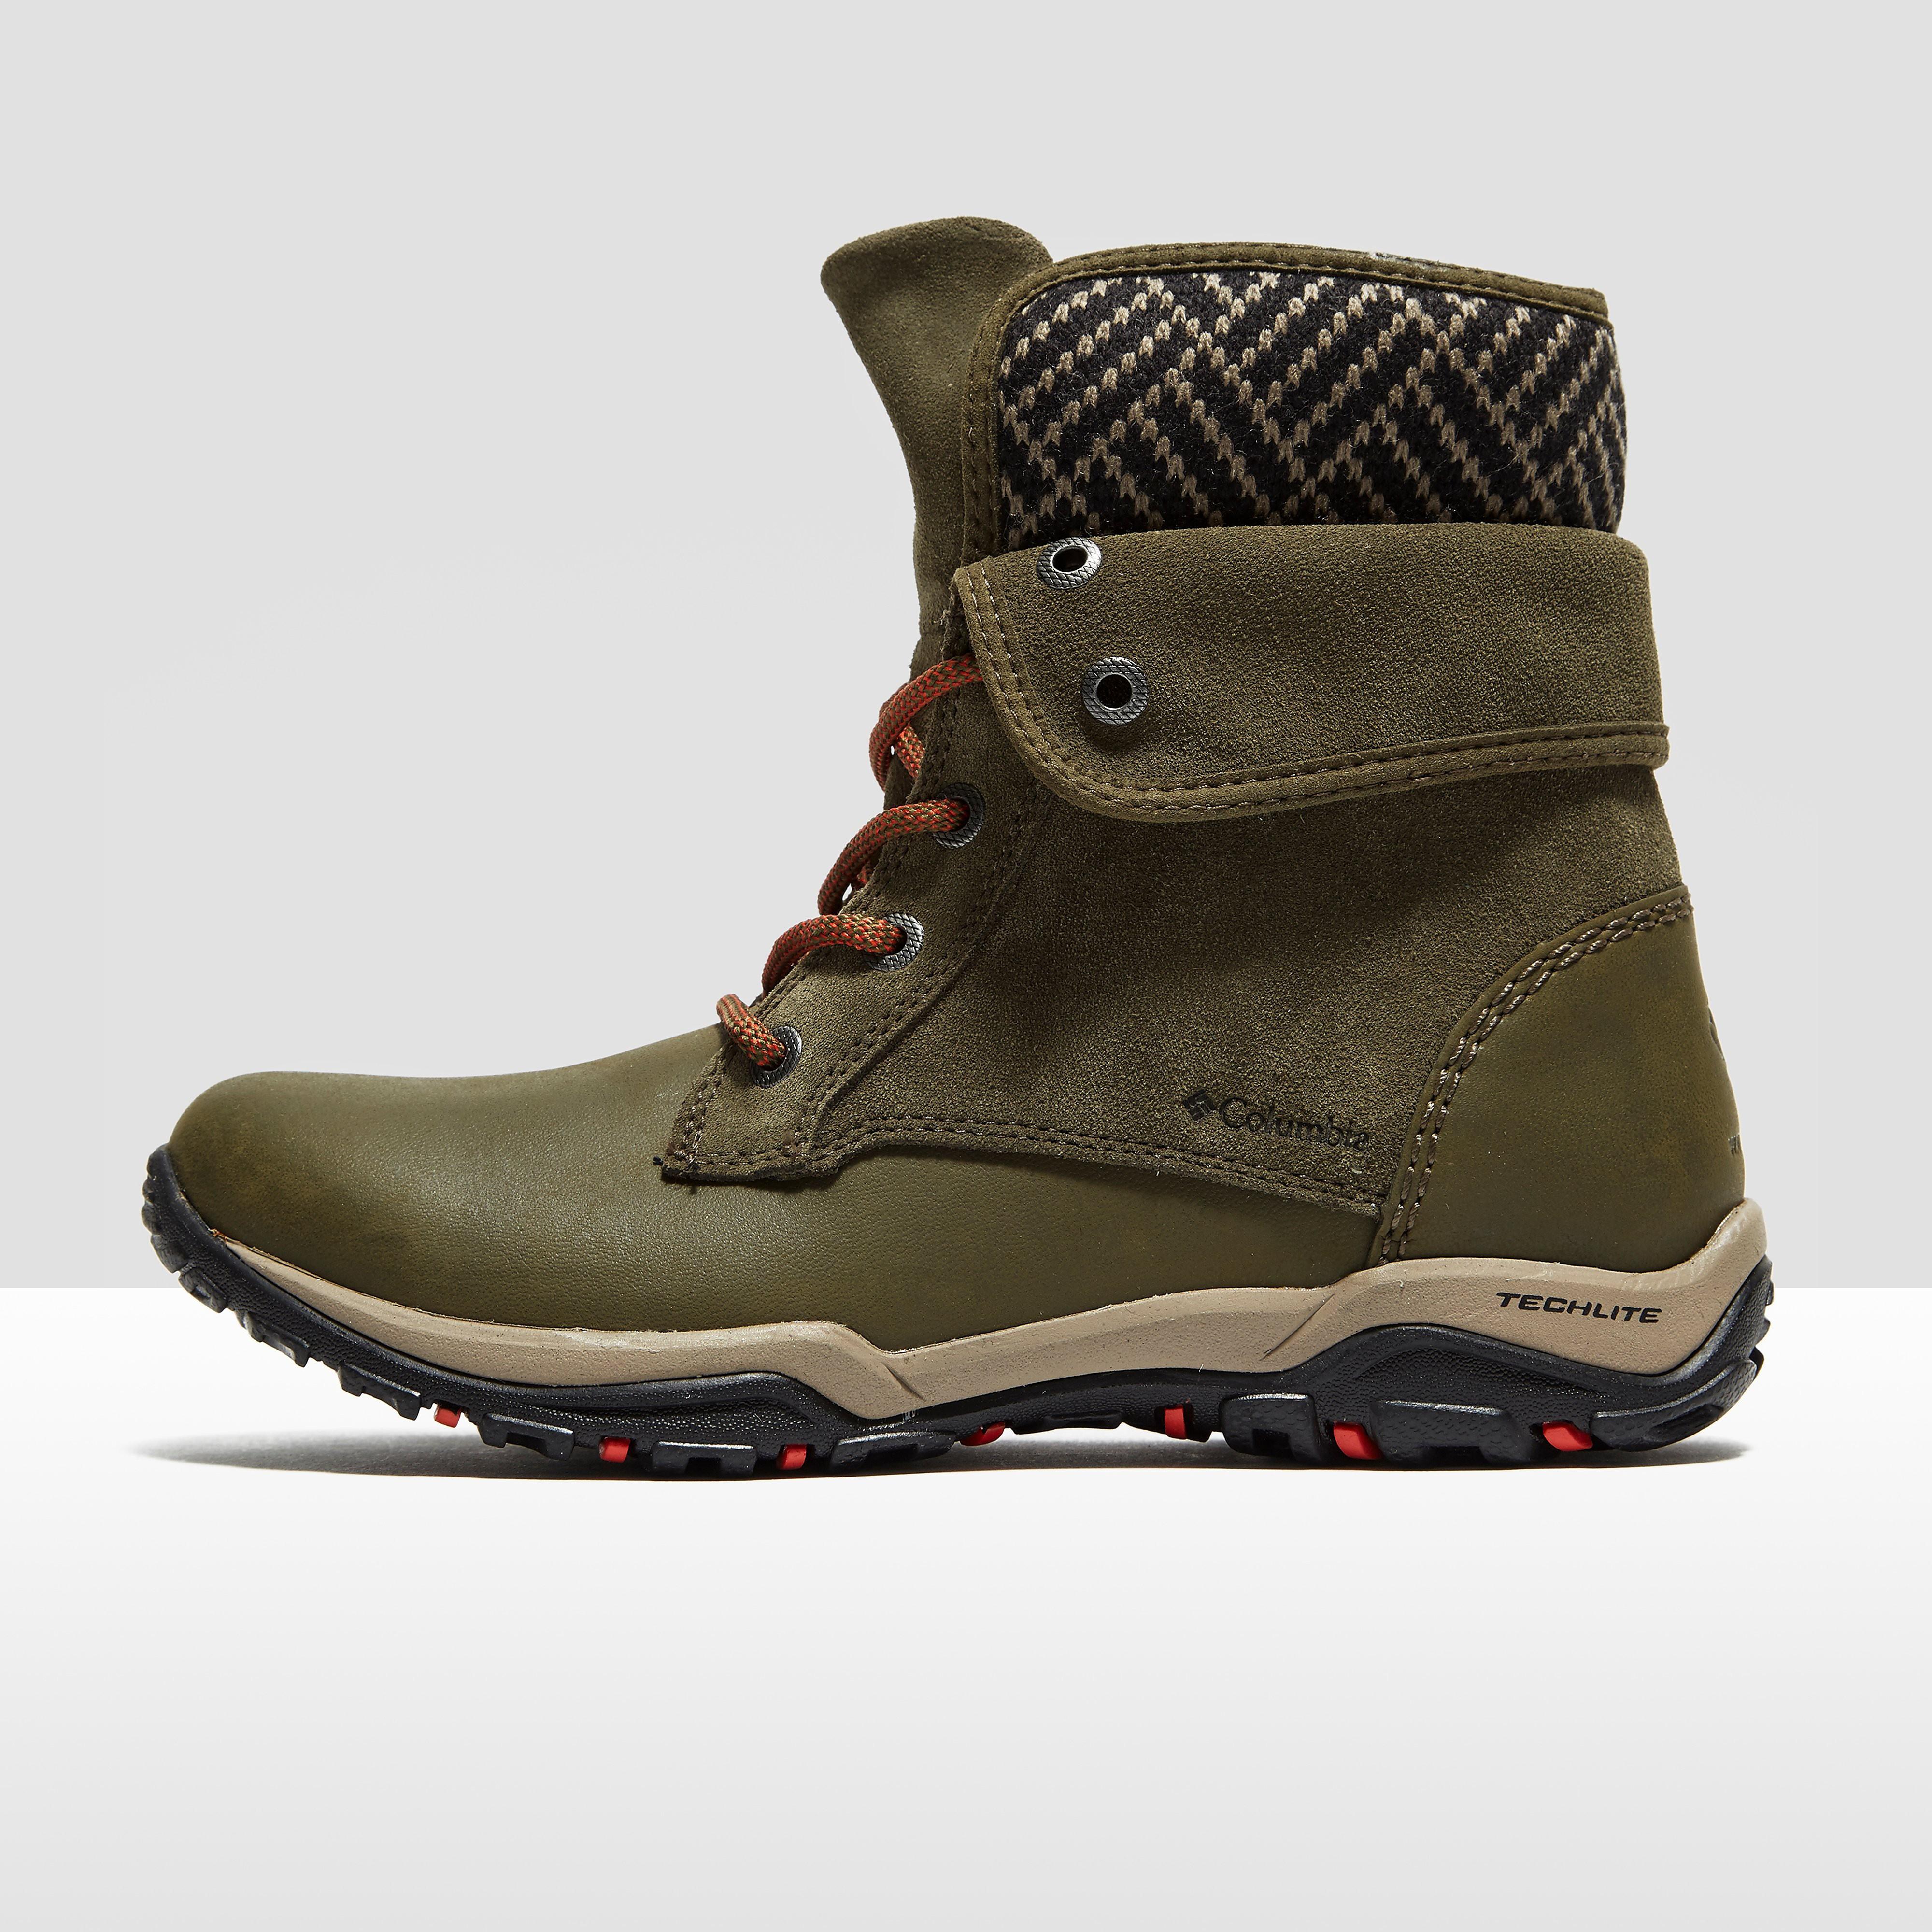 Columbia Women's Cityside Fold Waterproof Winter boots